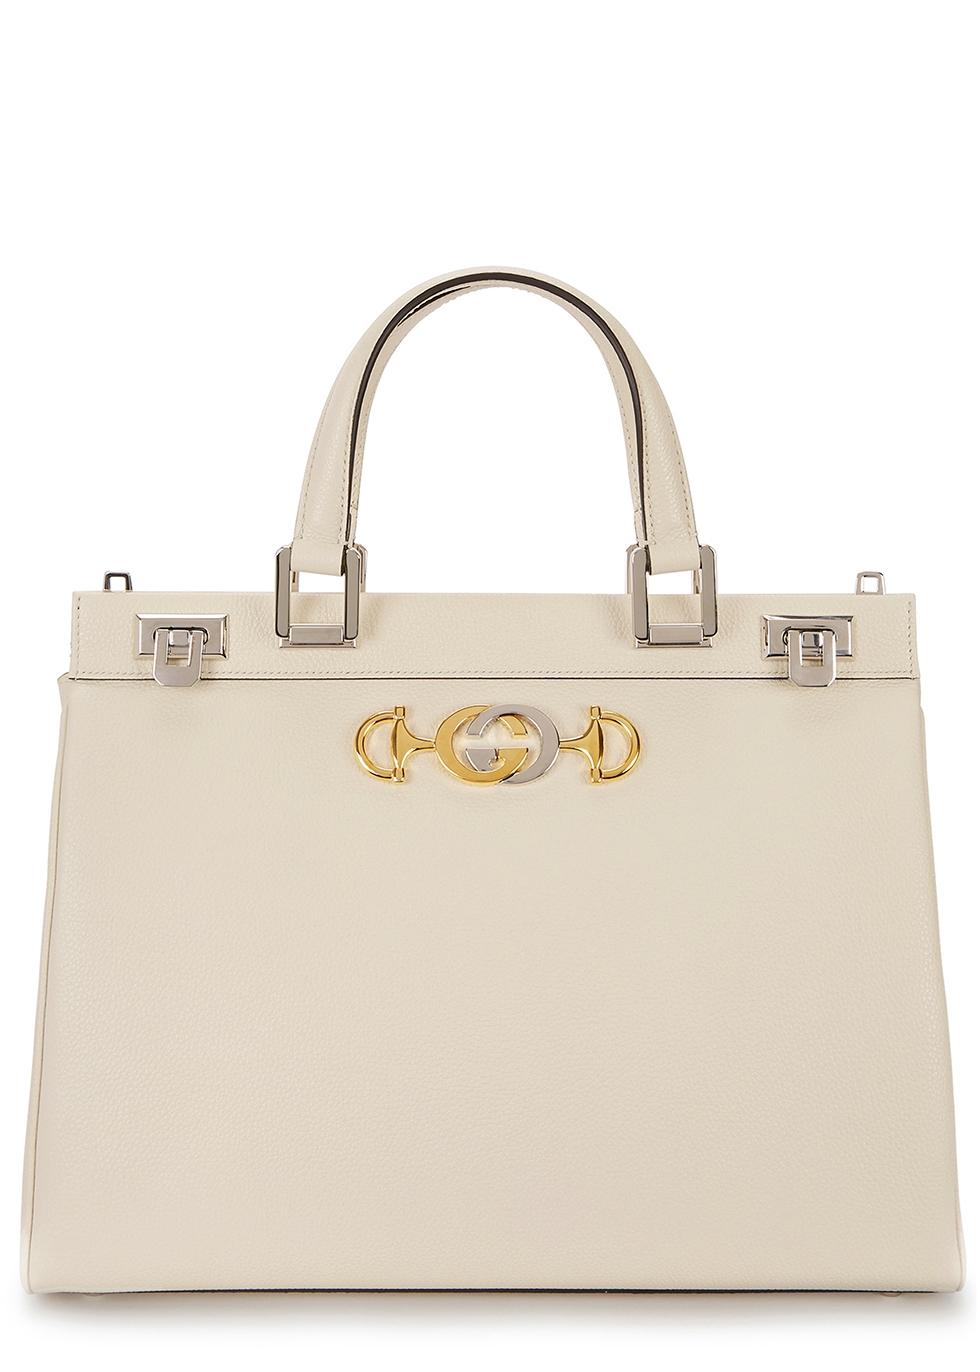 01f044943 Top handle bags - Harvey Nichols